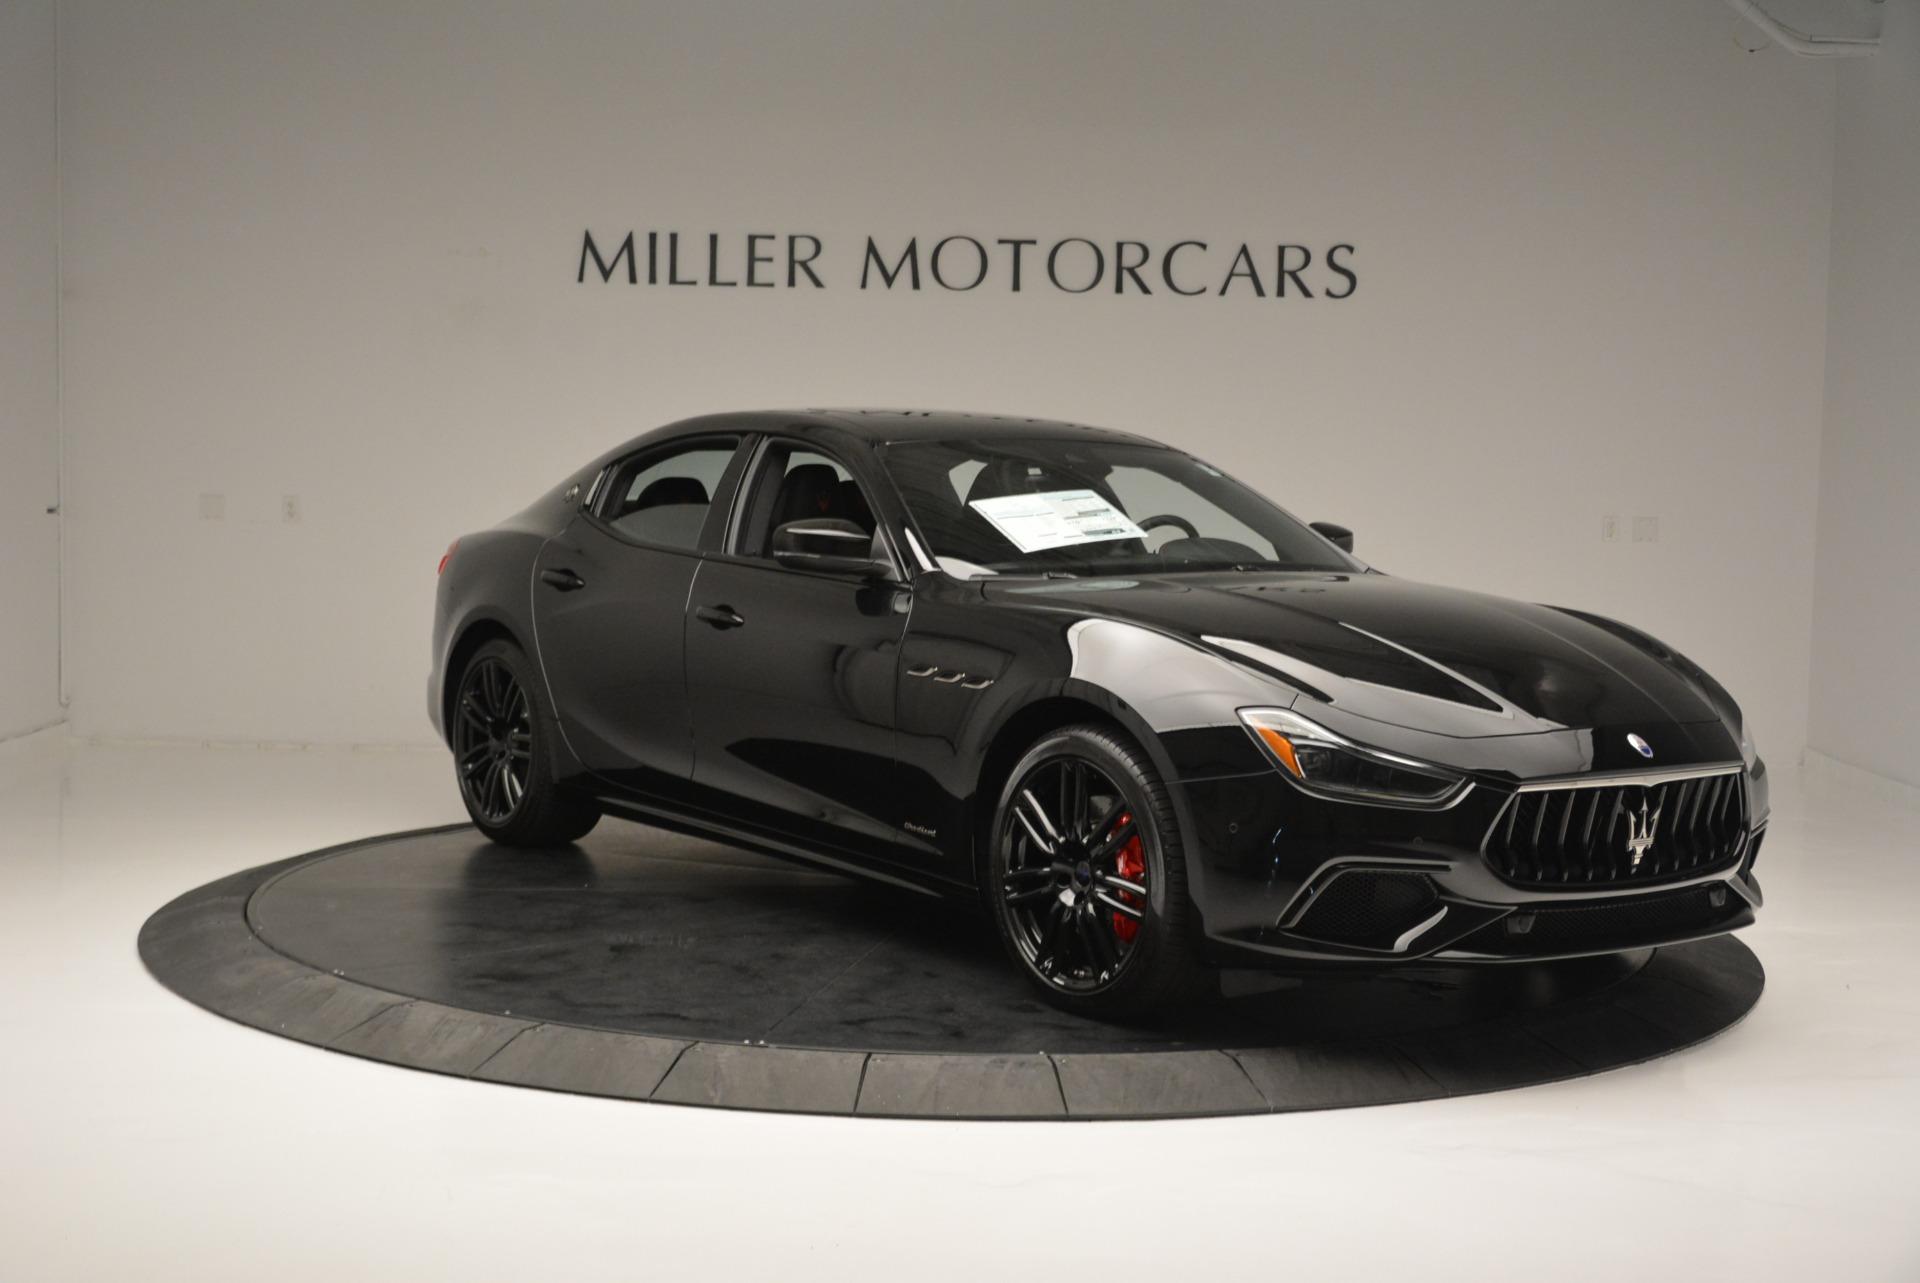 New 2018 Maserati Ghibli SQ4 GranSport Nerissimo For Sale In Westport, CT 2368_p11